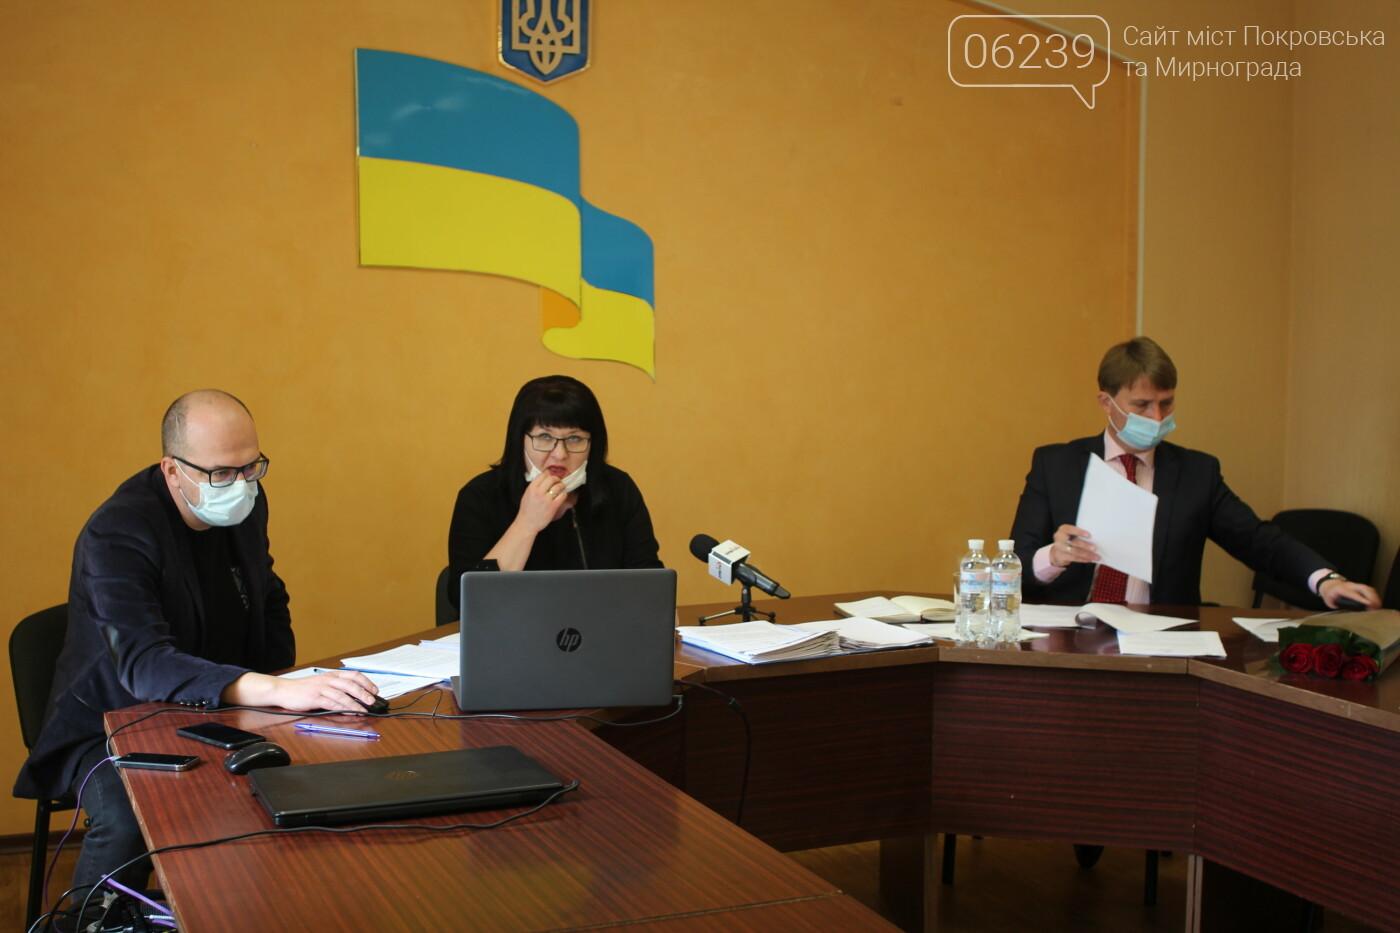 В Мирнограде сессия горсовета снова проходила в онлайн-режиме (вопросы повестки дня), фото-5